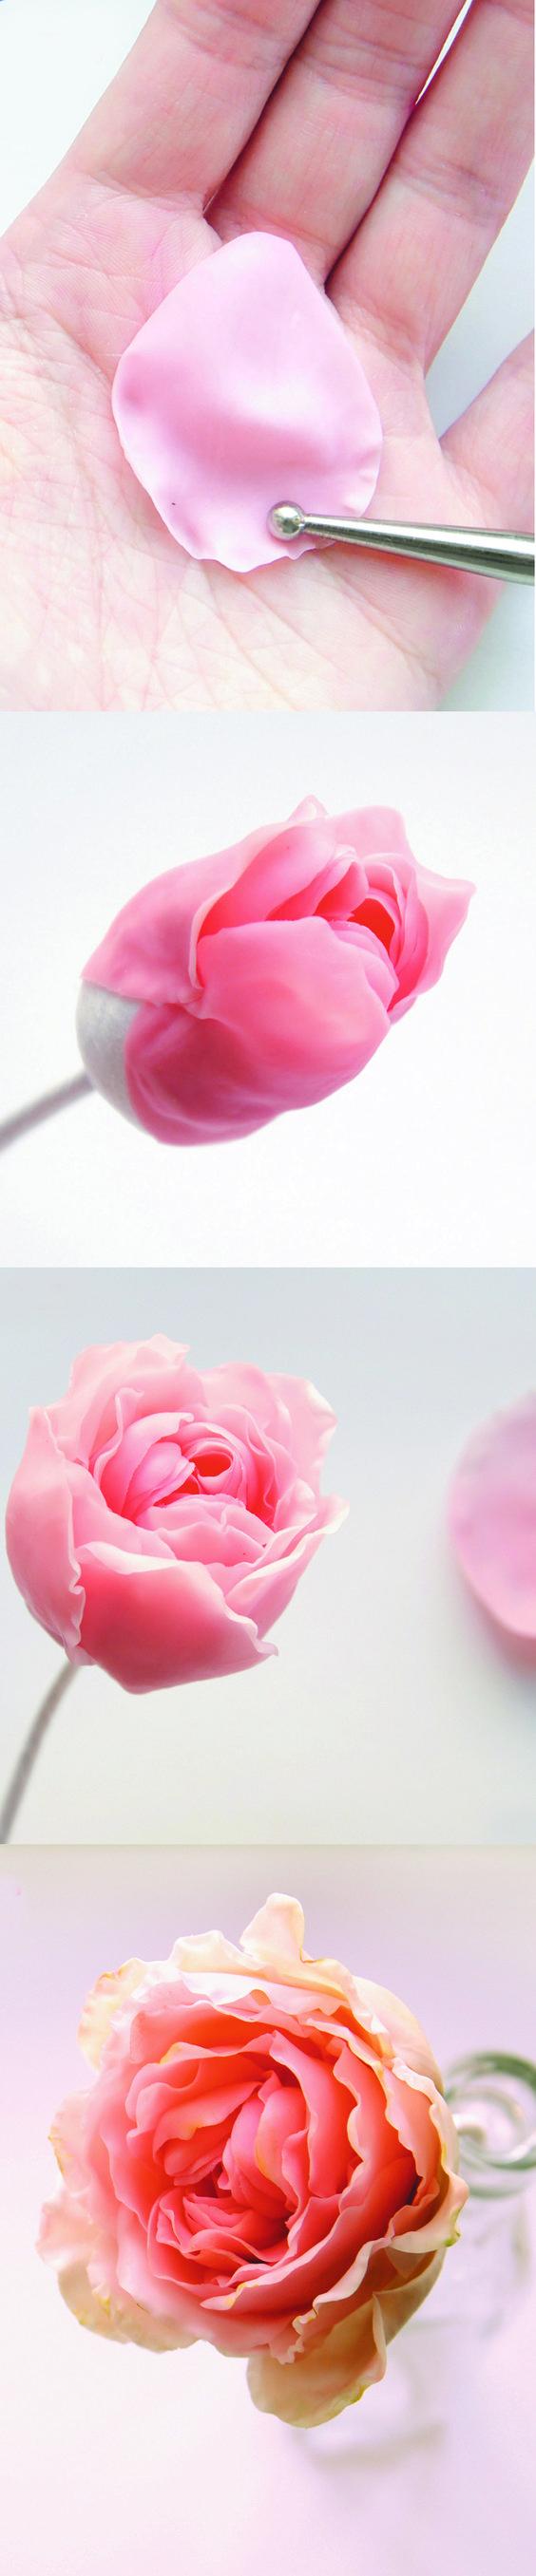 DIY Rose of polymer clay. #PhoenixPublishingHouse #handmade #polymerclay